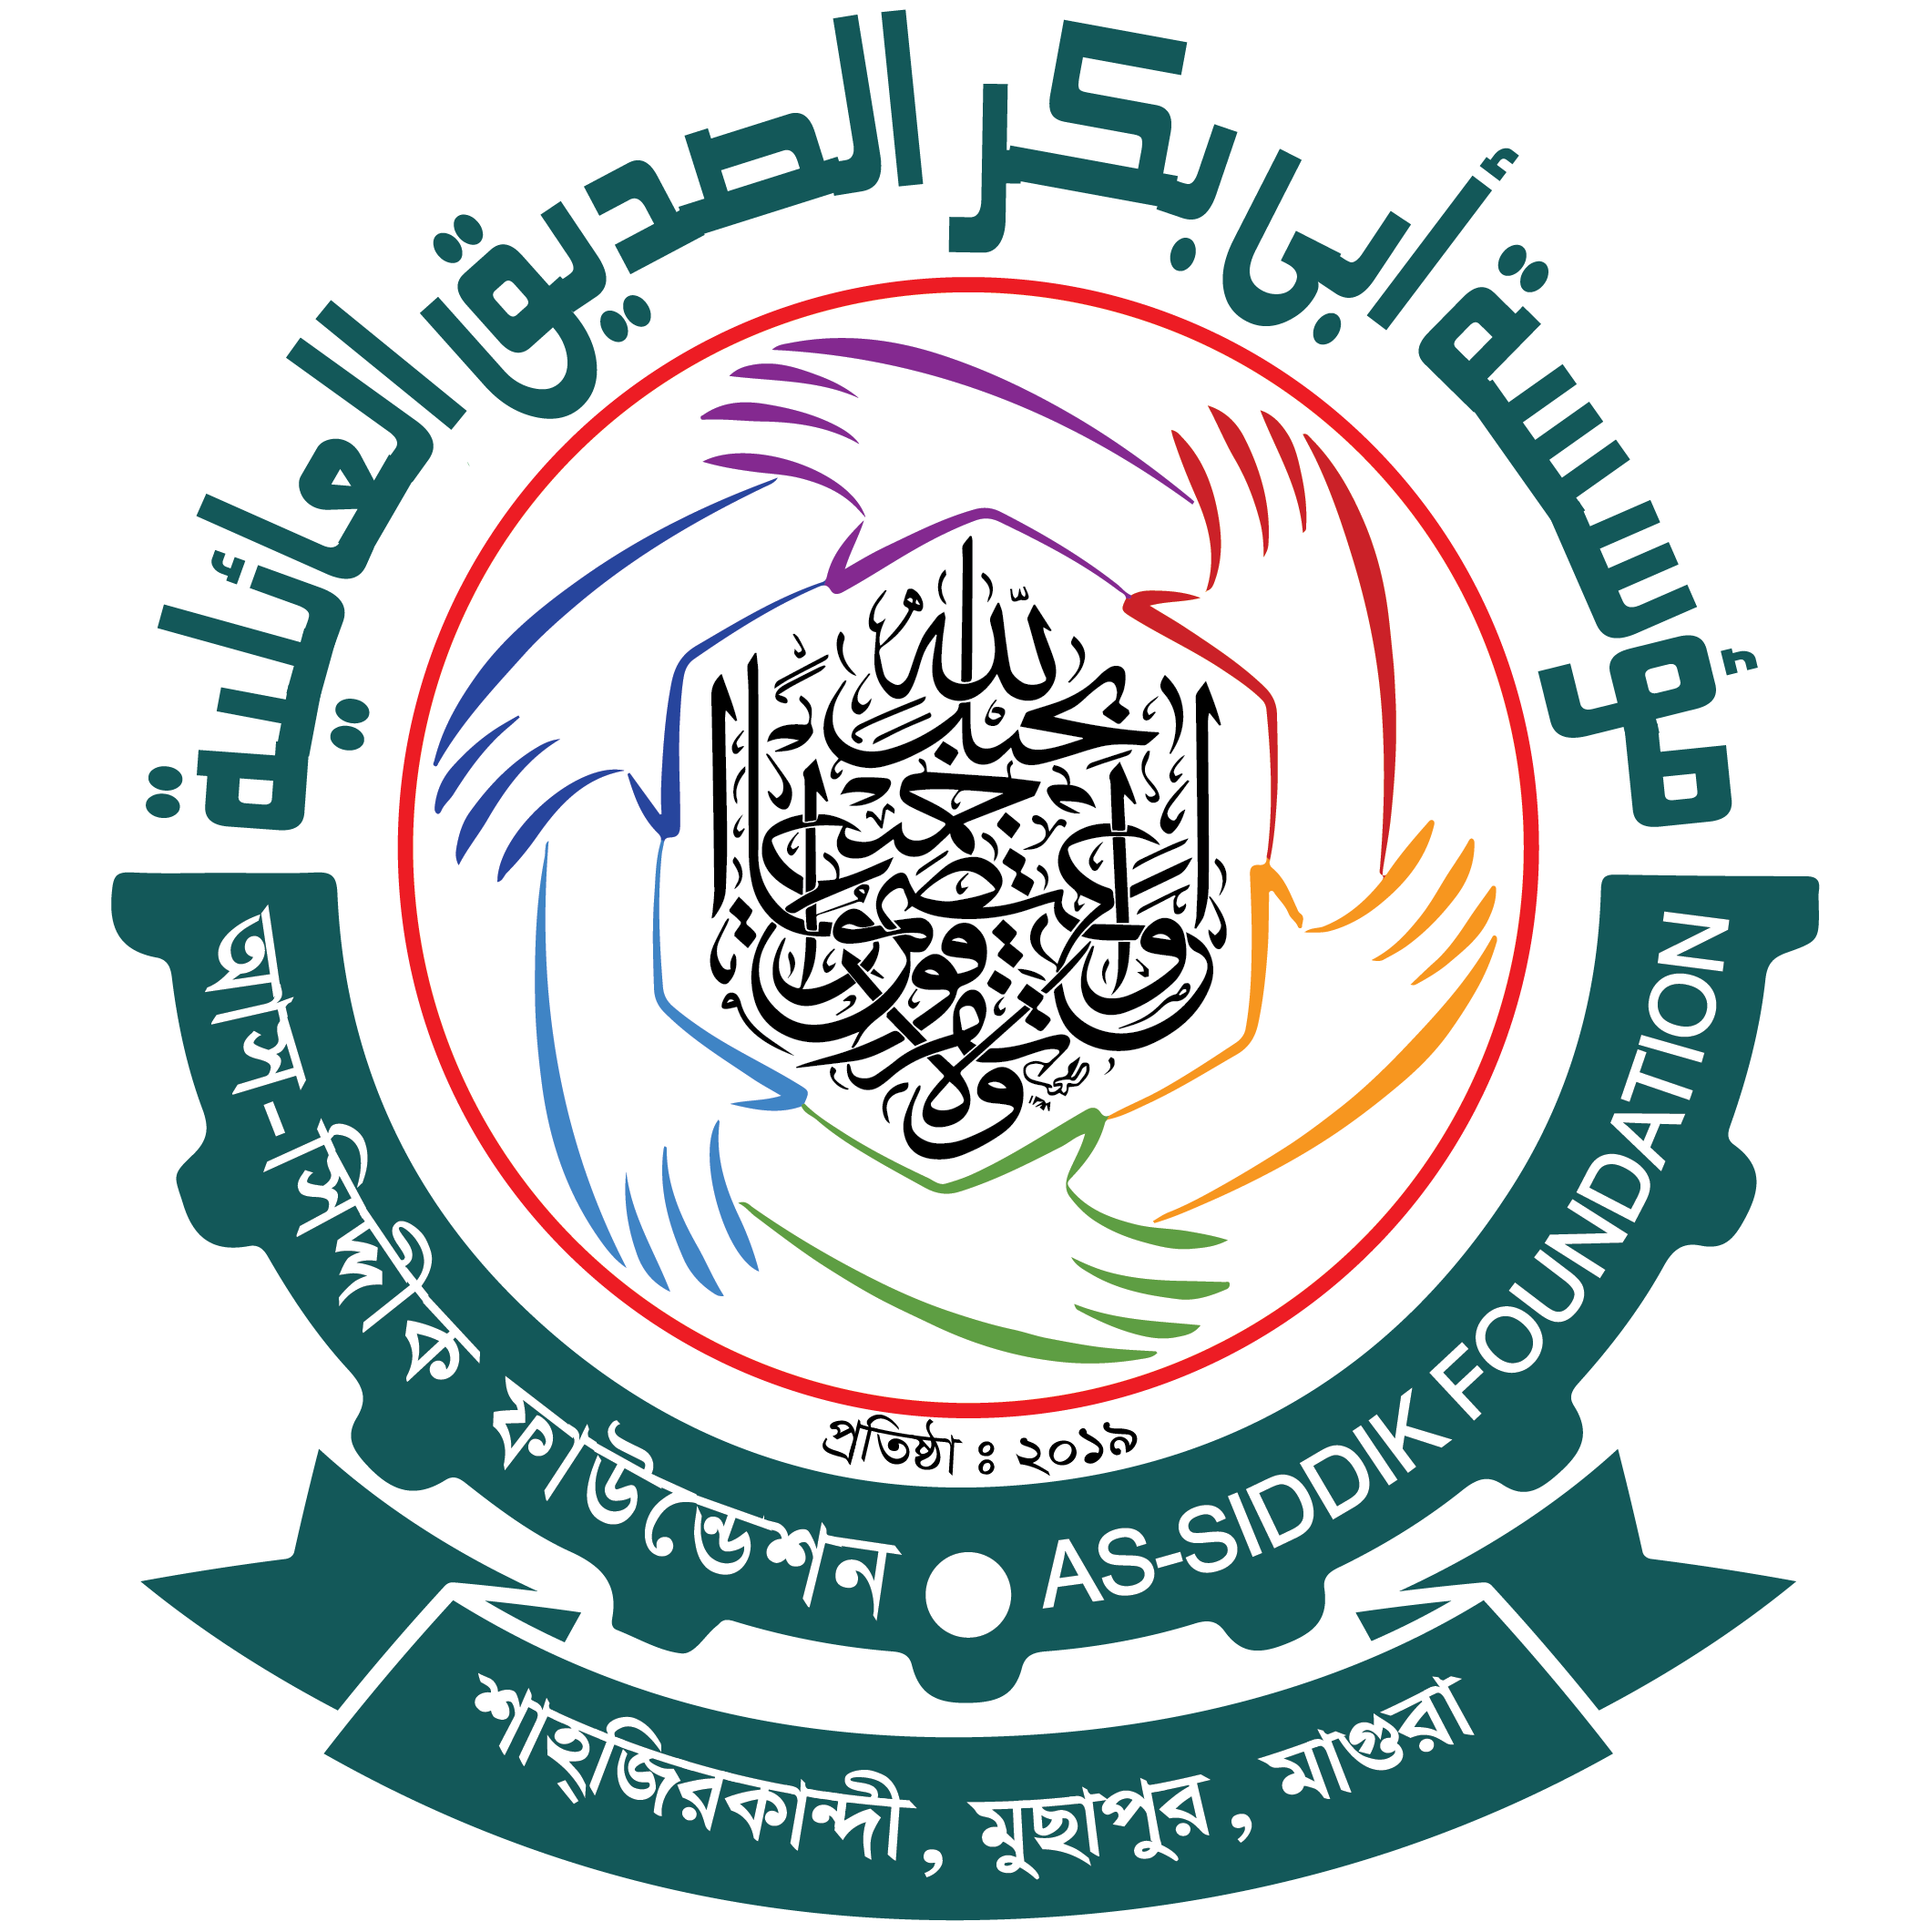 www.assiddik.com